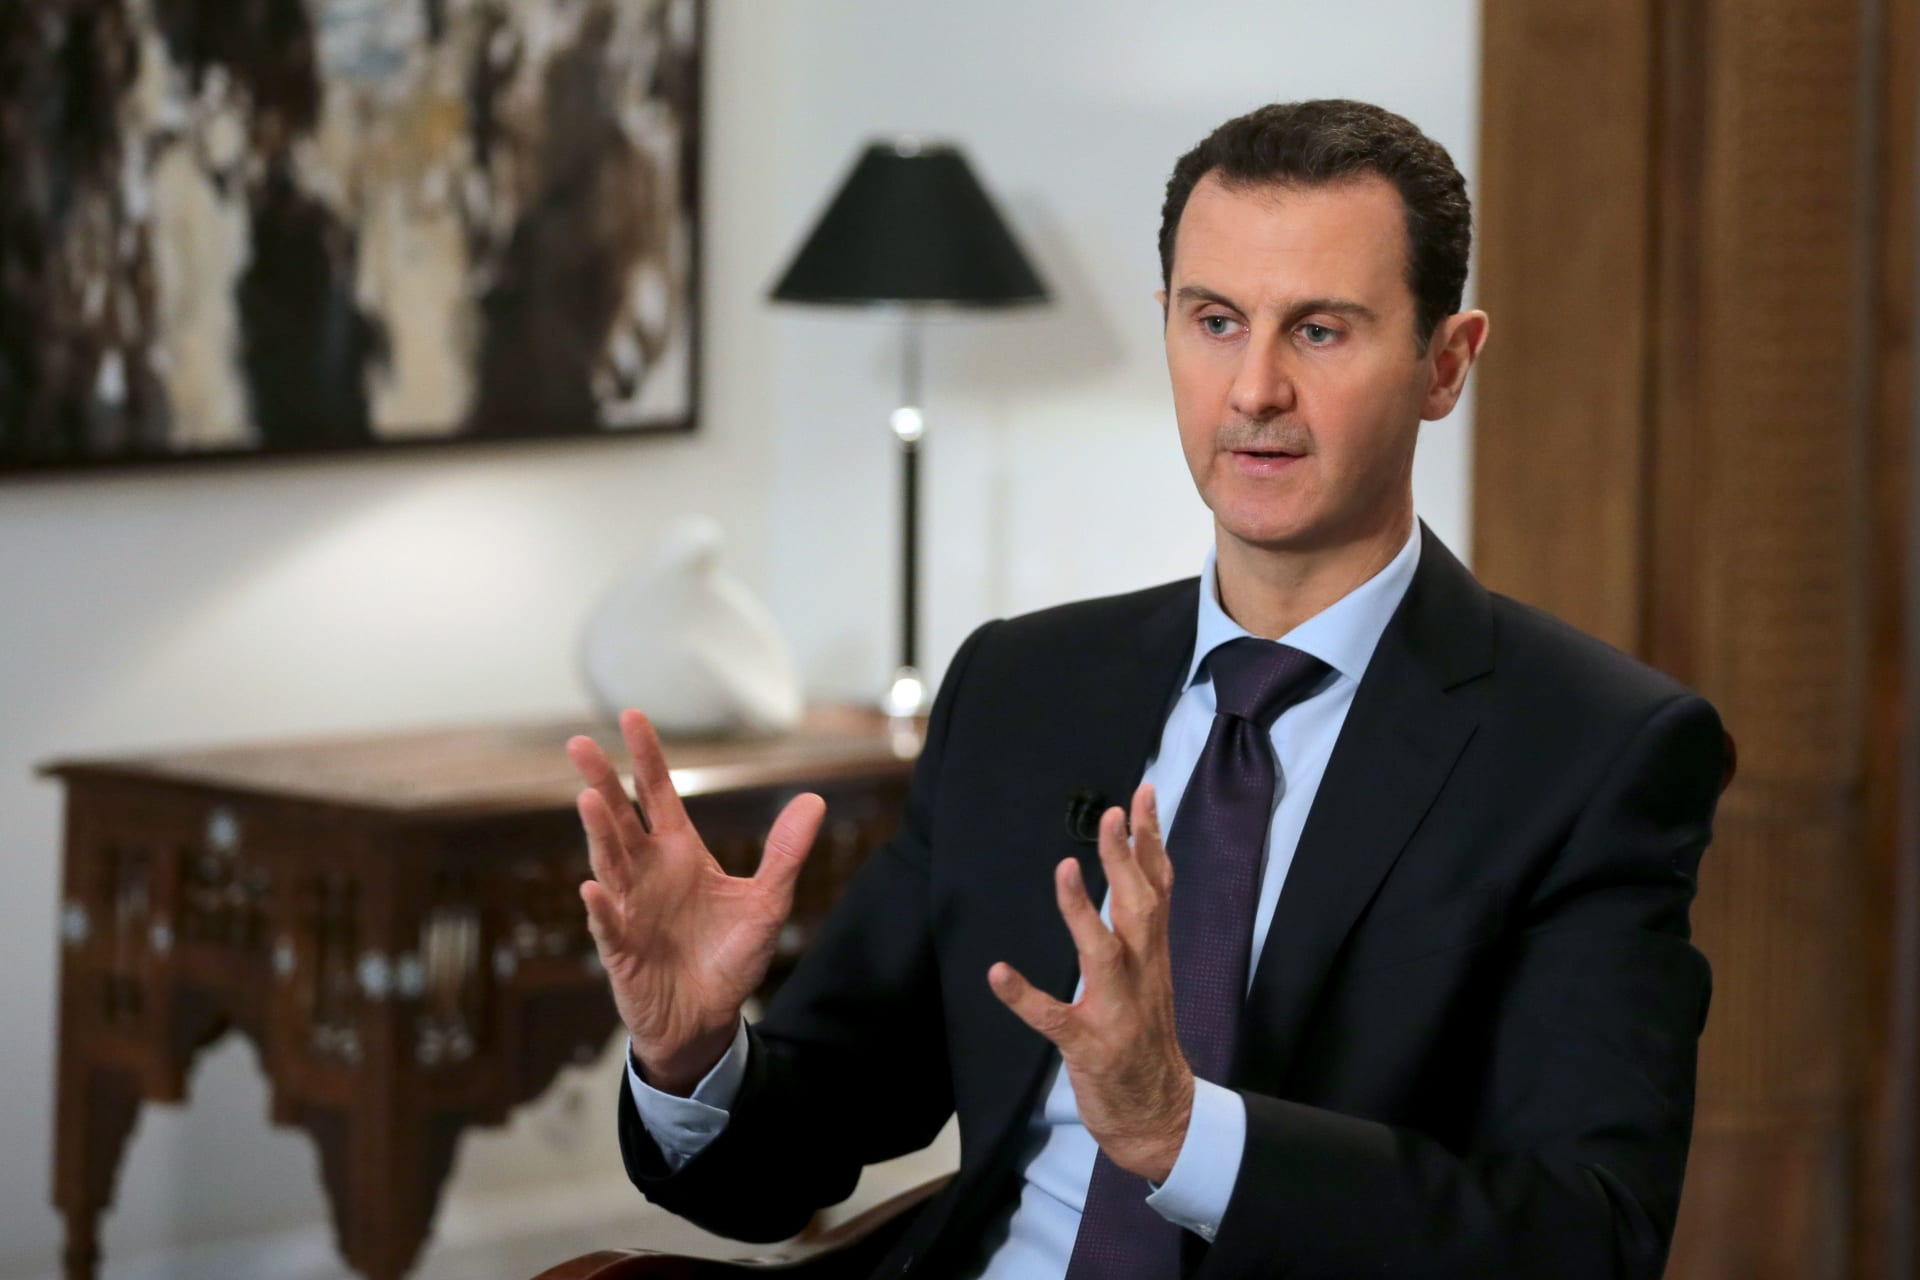 سوريا ترحب باتفاق روسي تركي حول إدلب.. فماذا قالت إيران؟